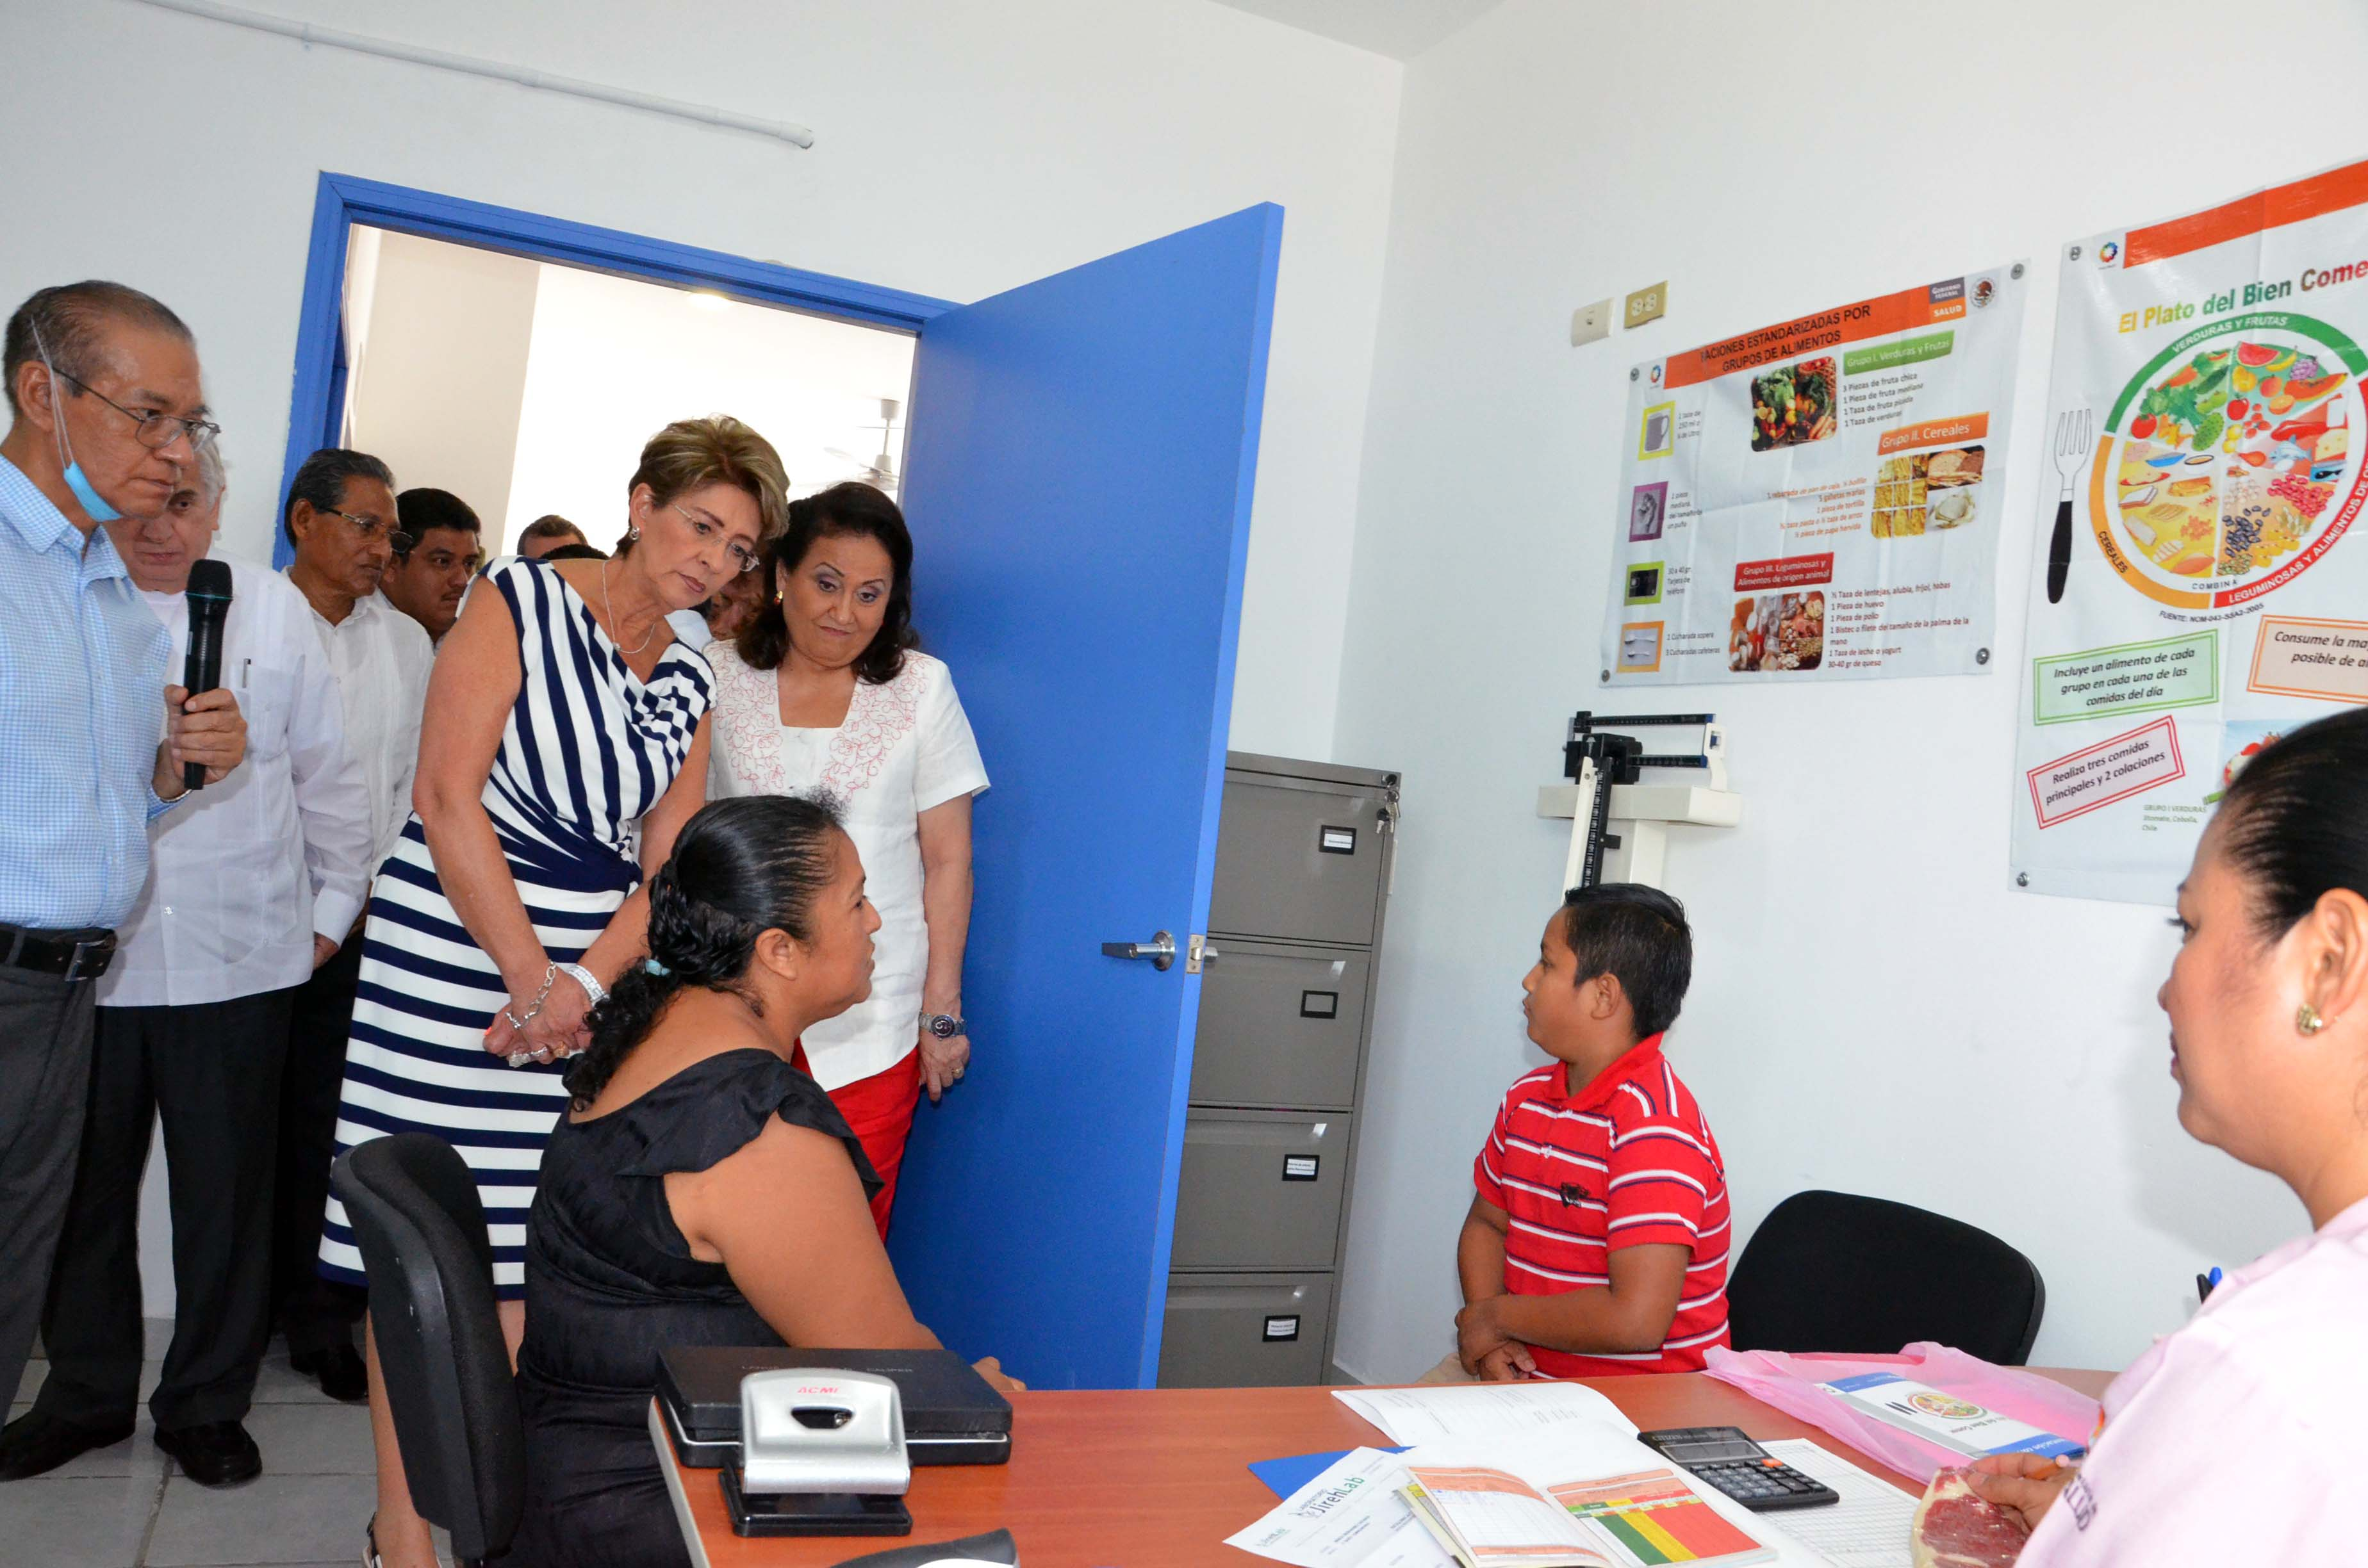 070515 Centro de Salud Cardenas  09jpg